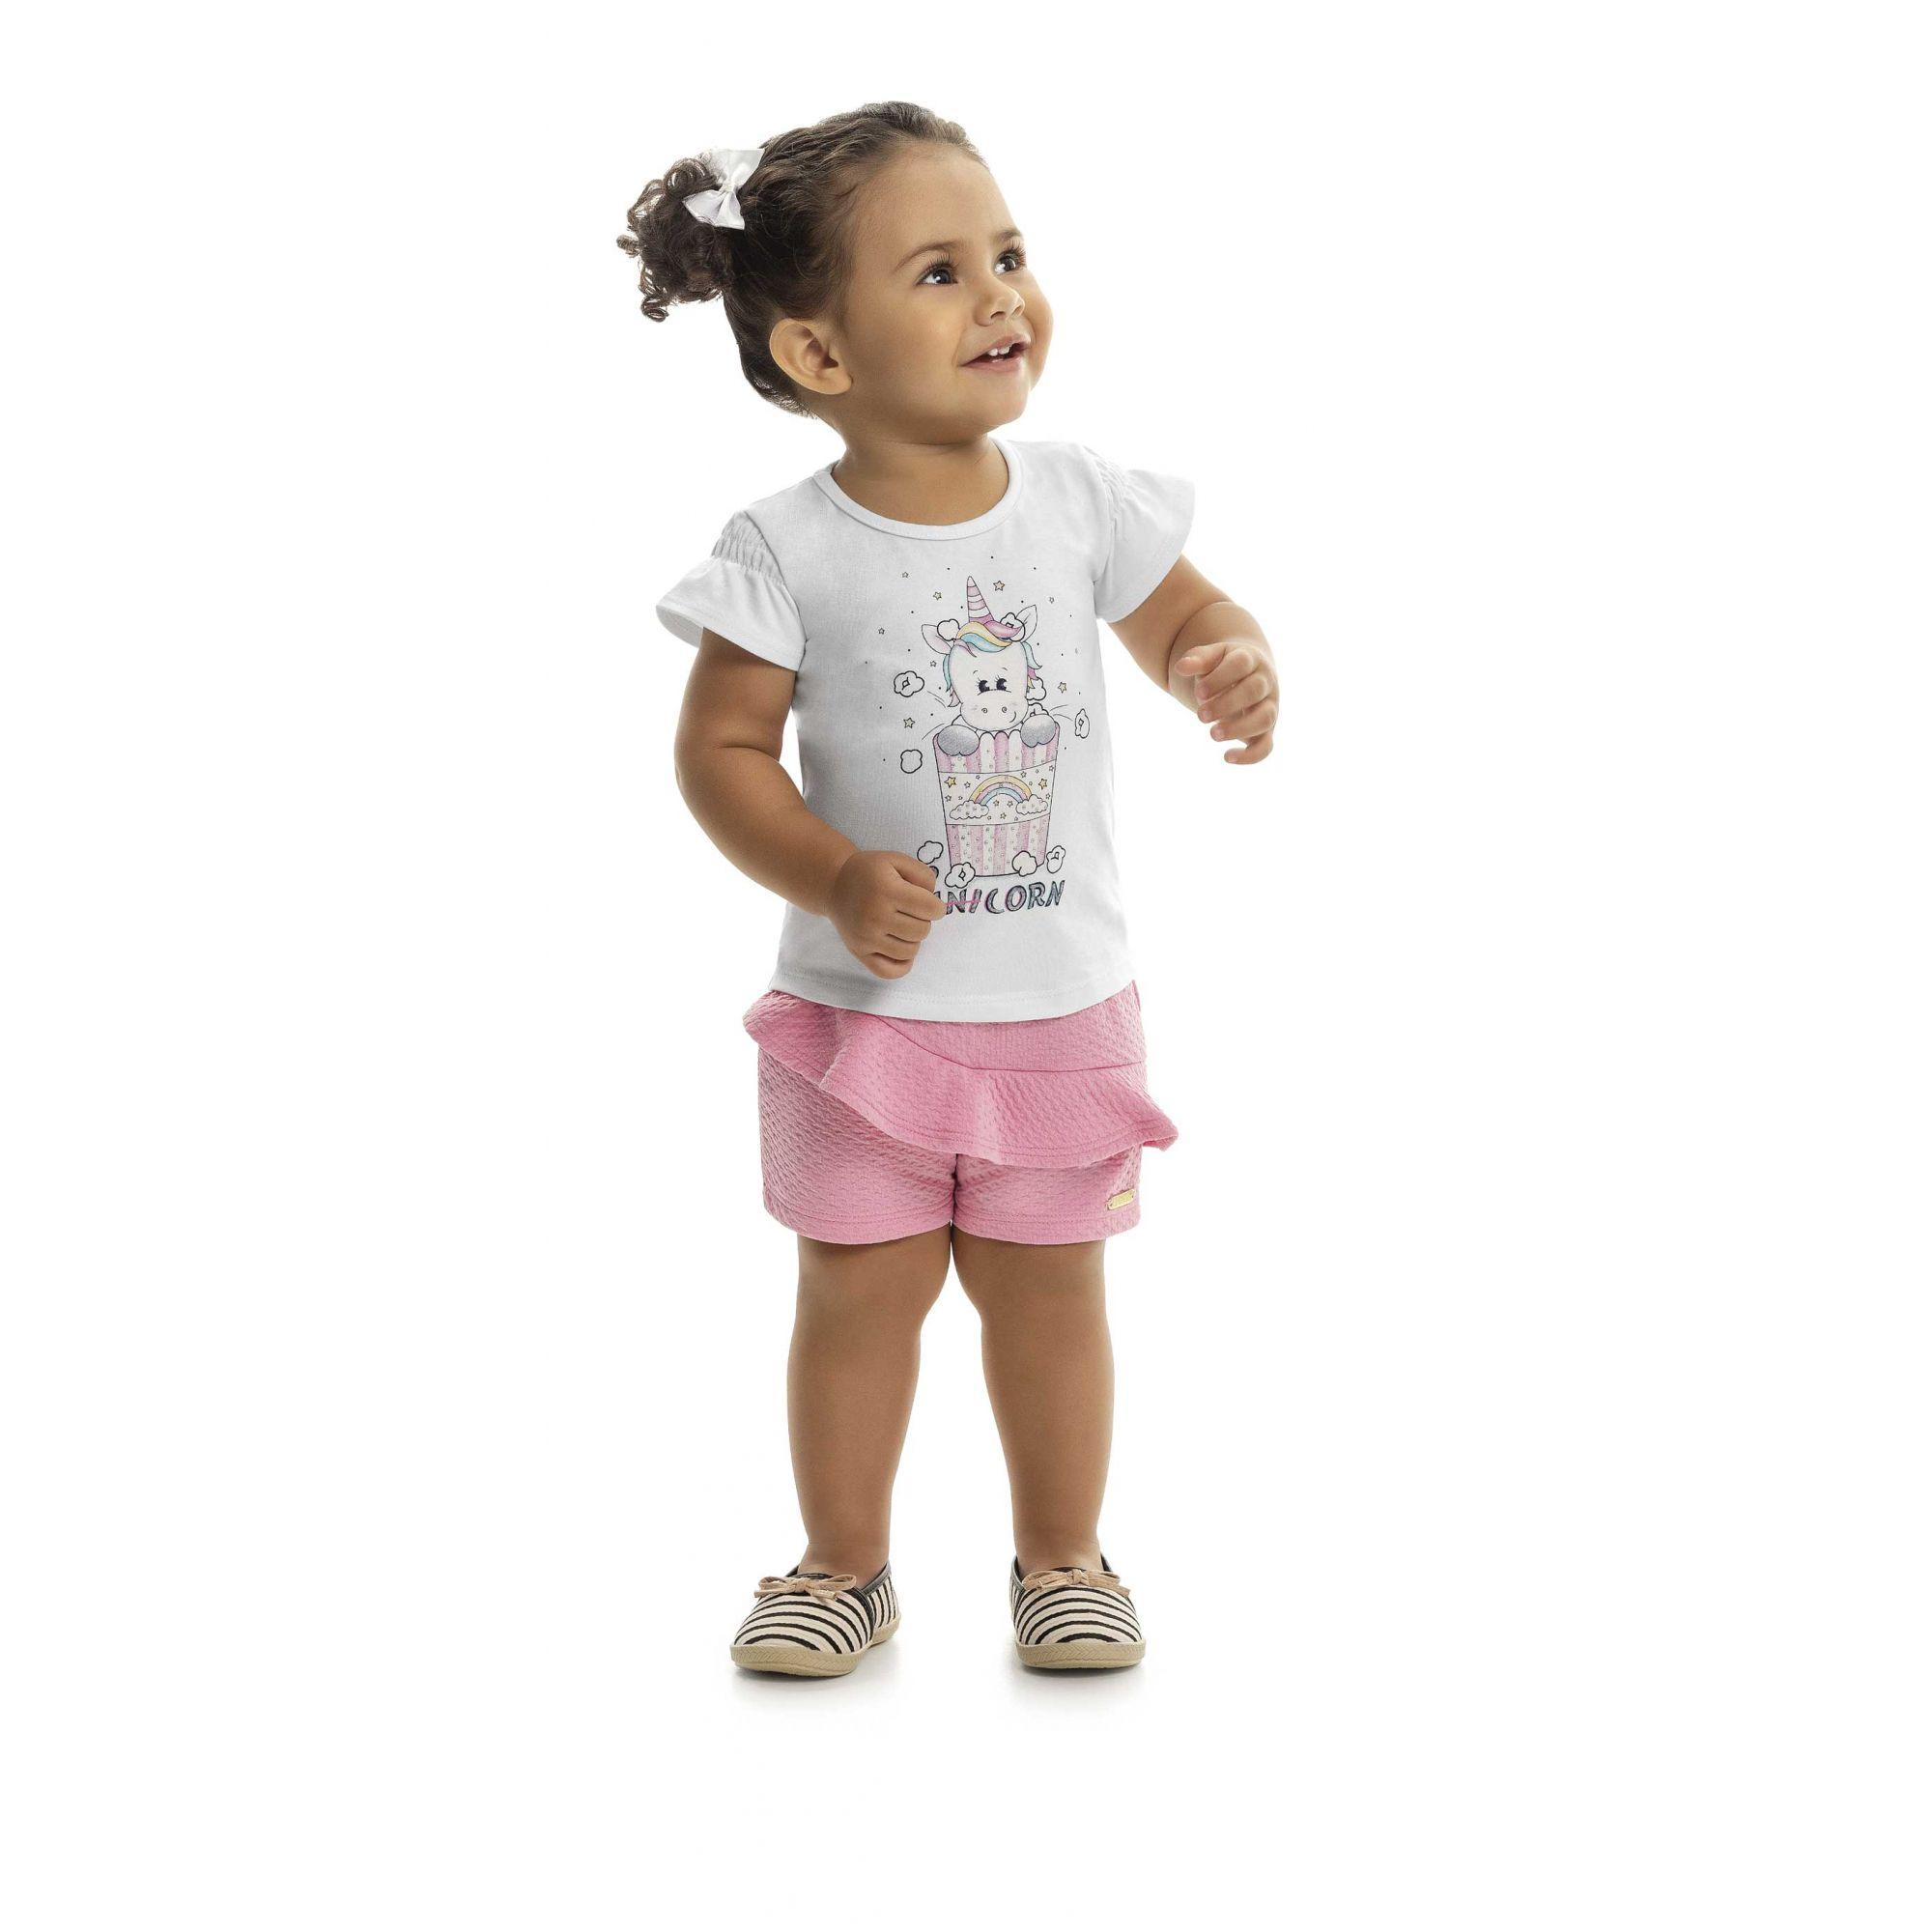 Blusa Bebê Menina Verão Pop Unicorn  - Kaiani